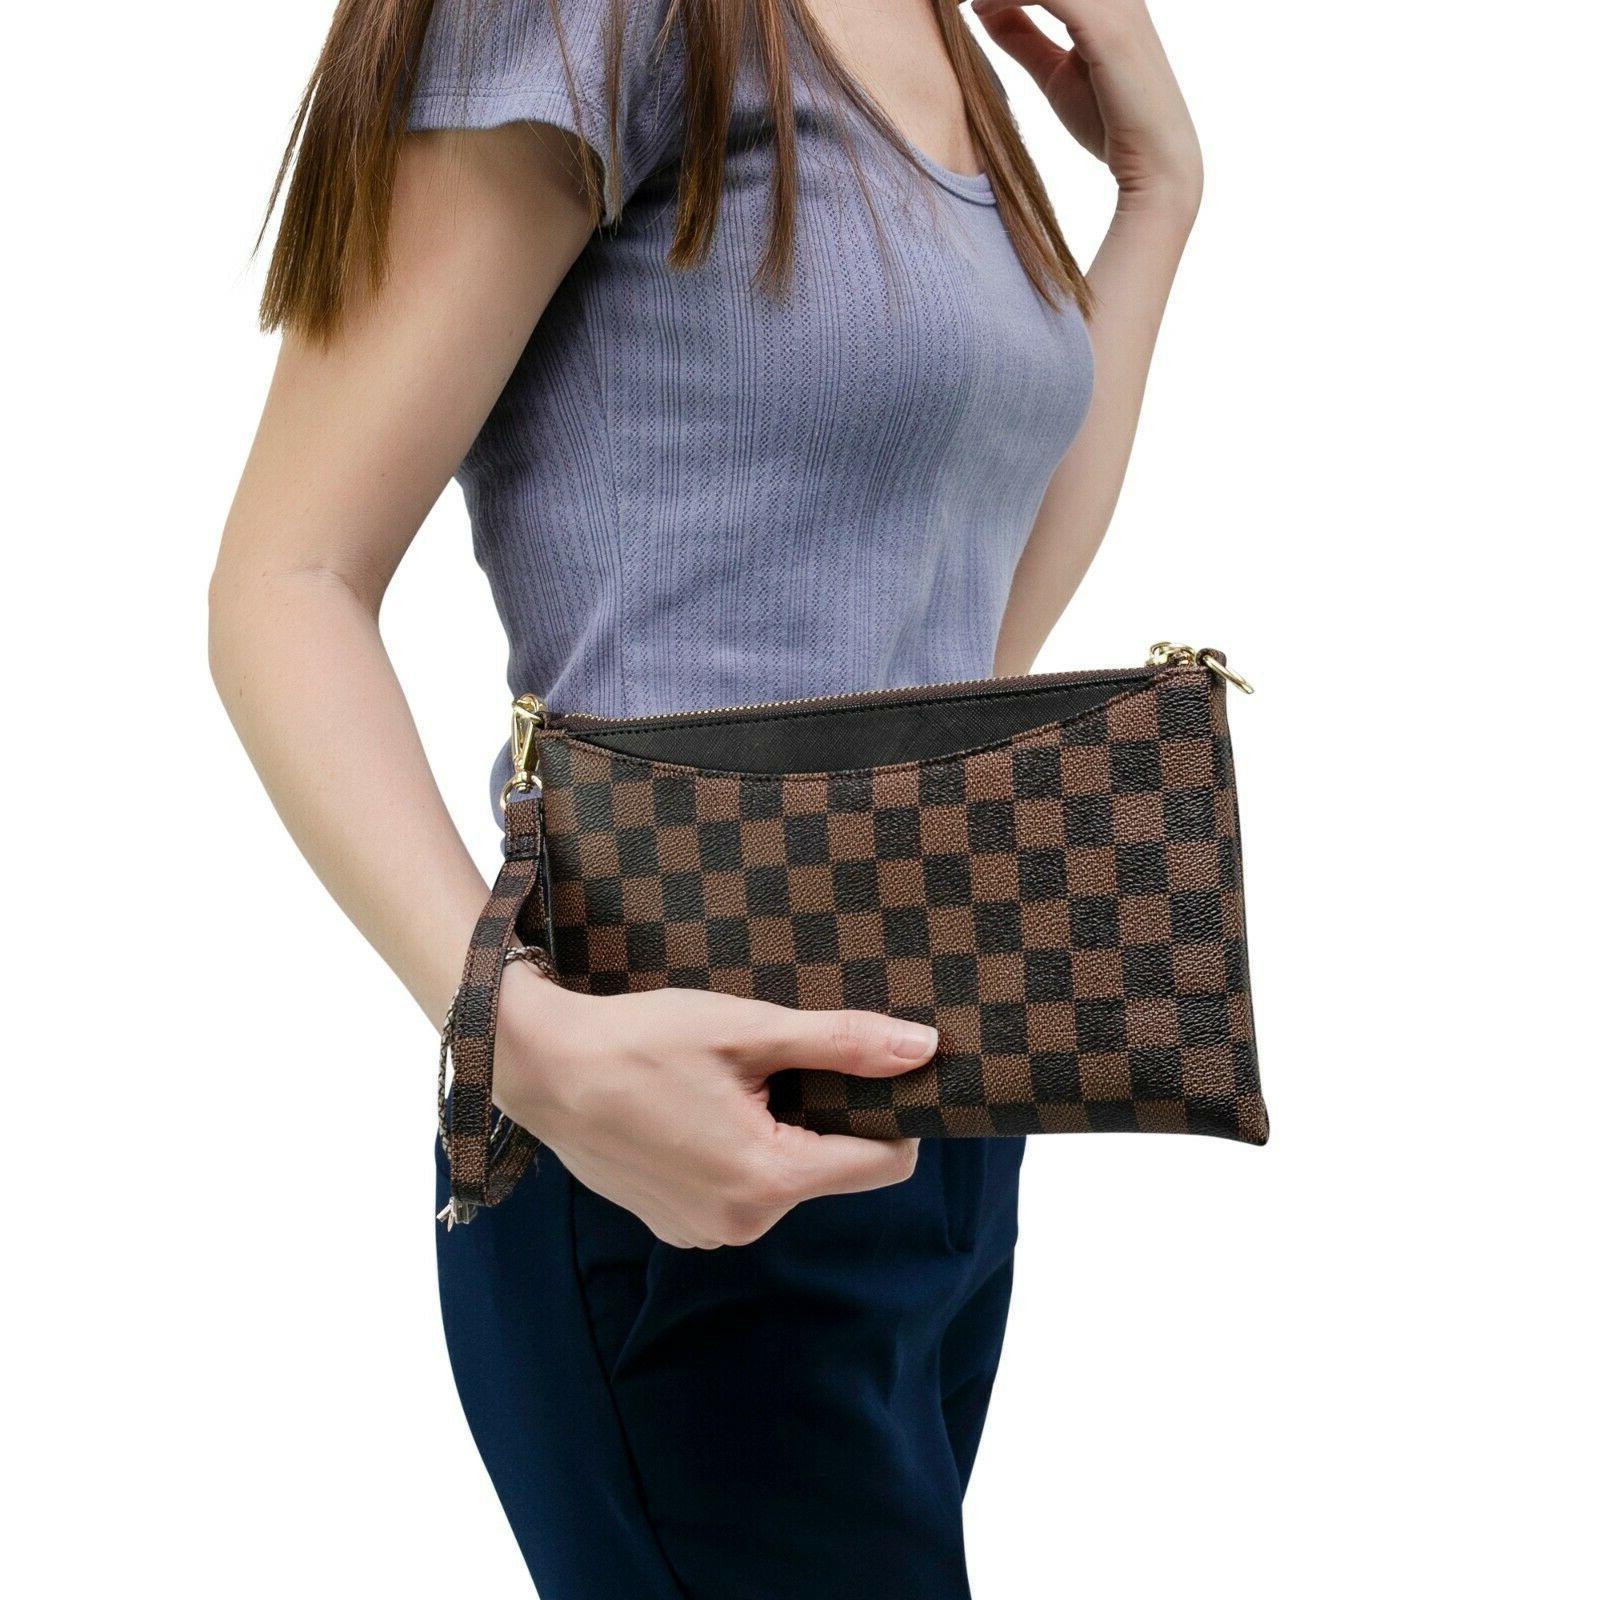 Luxury Crossbody for Women Leather